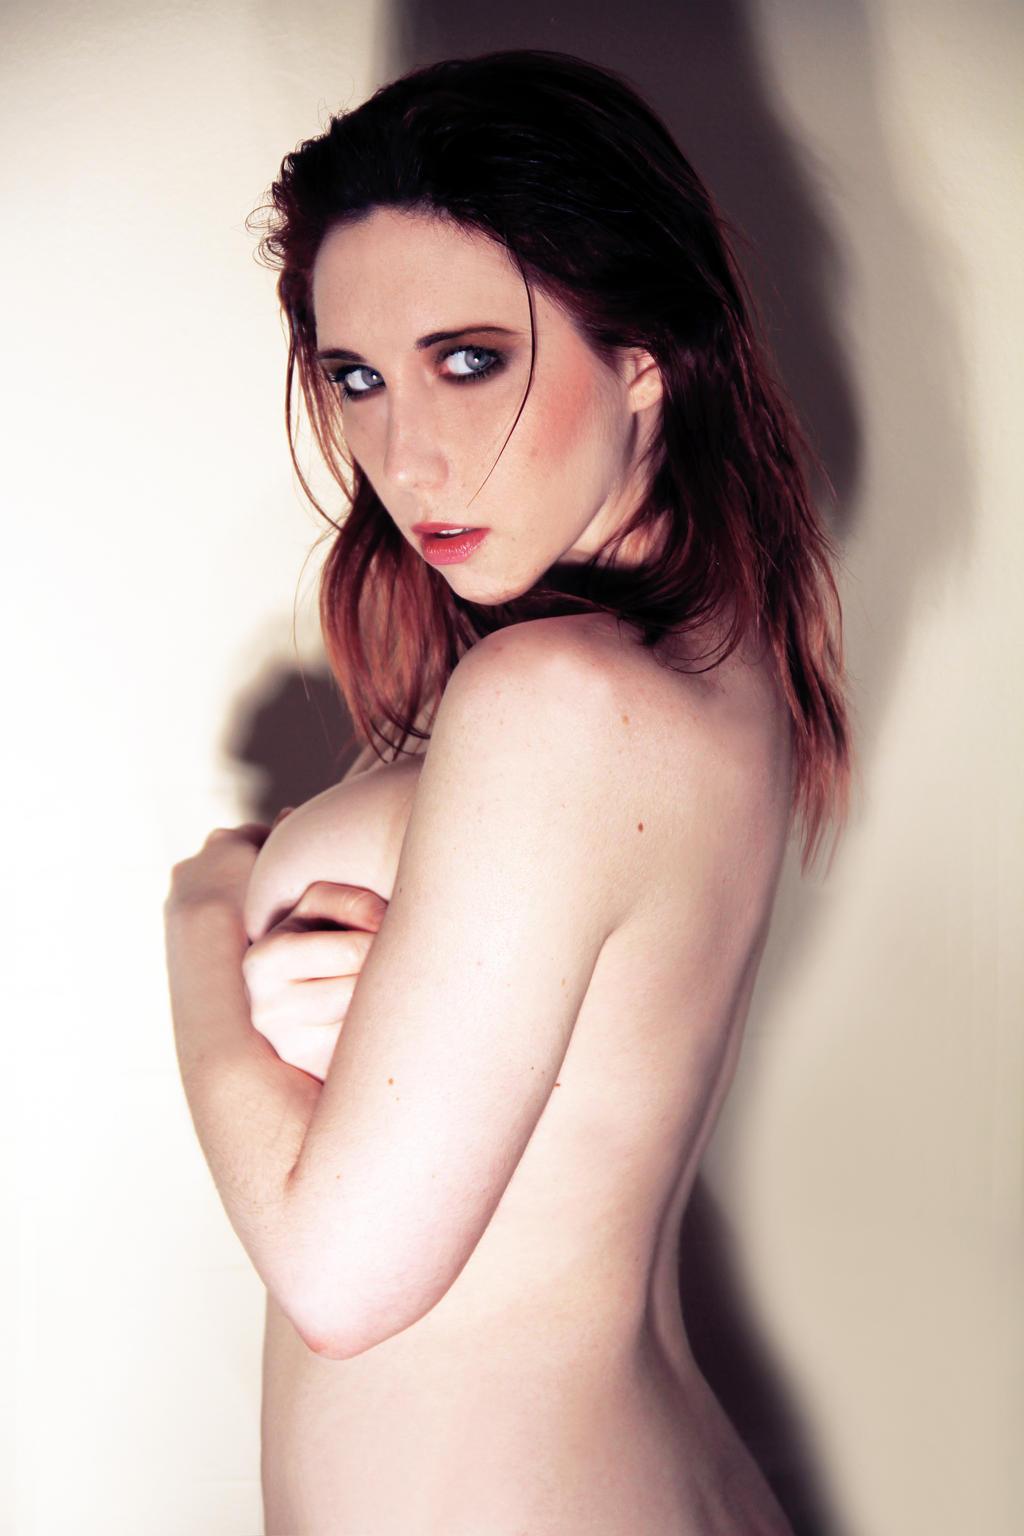 Stephanie-van-rijn nude